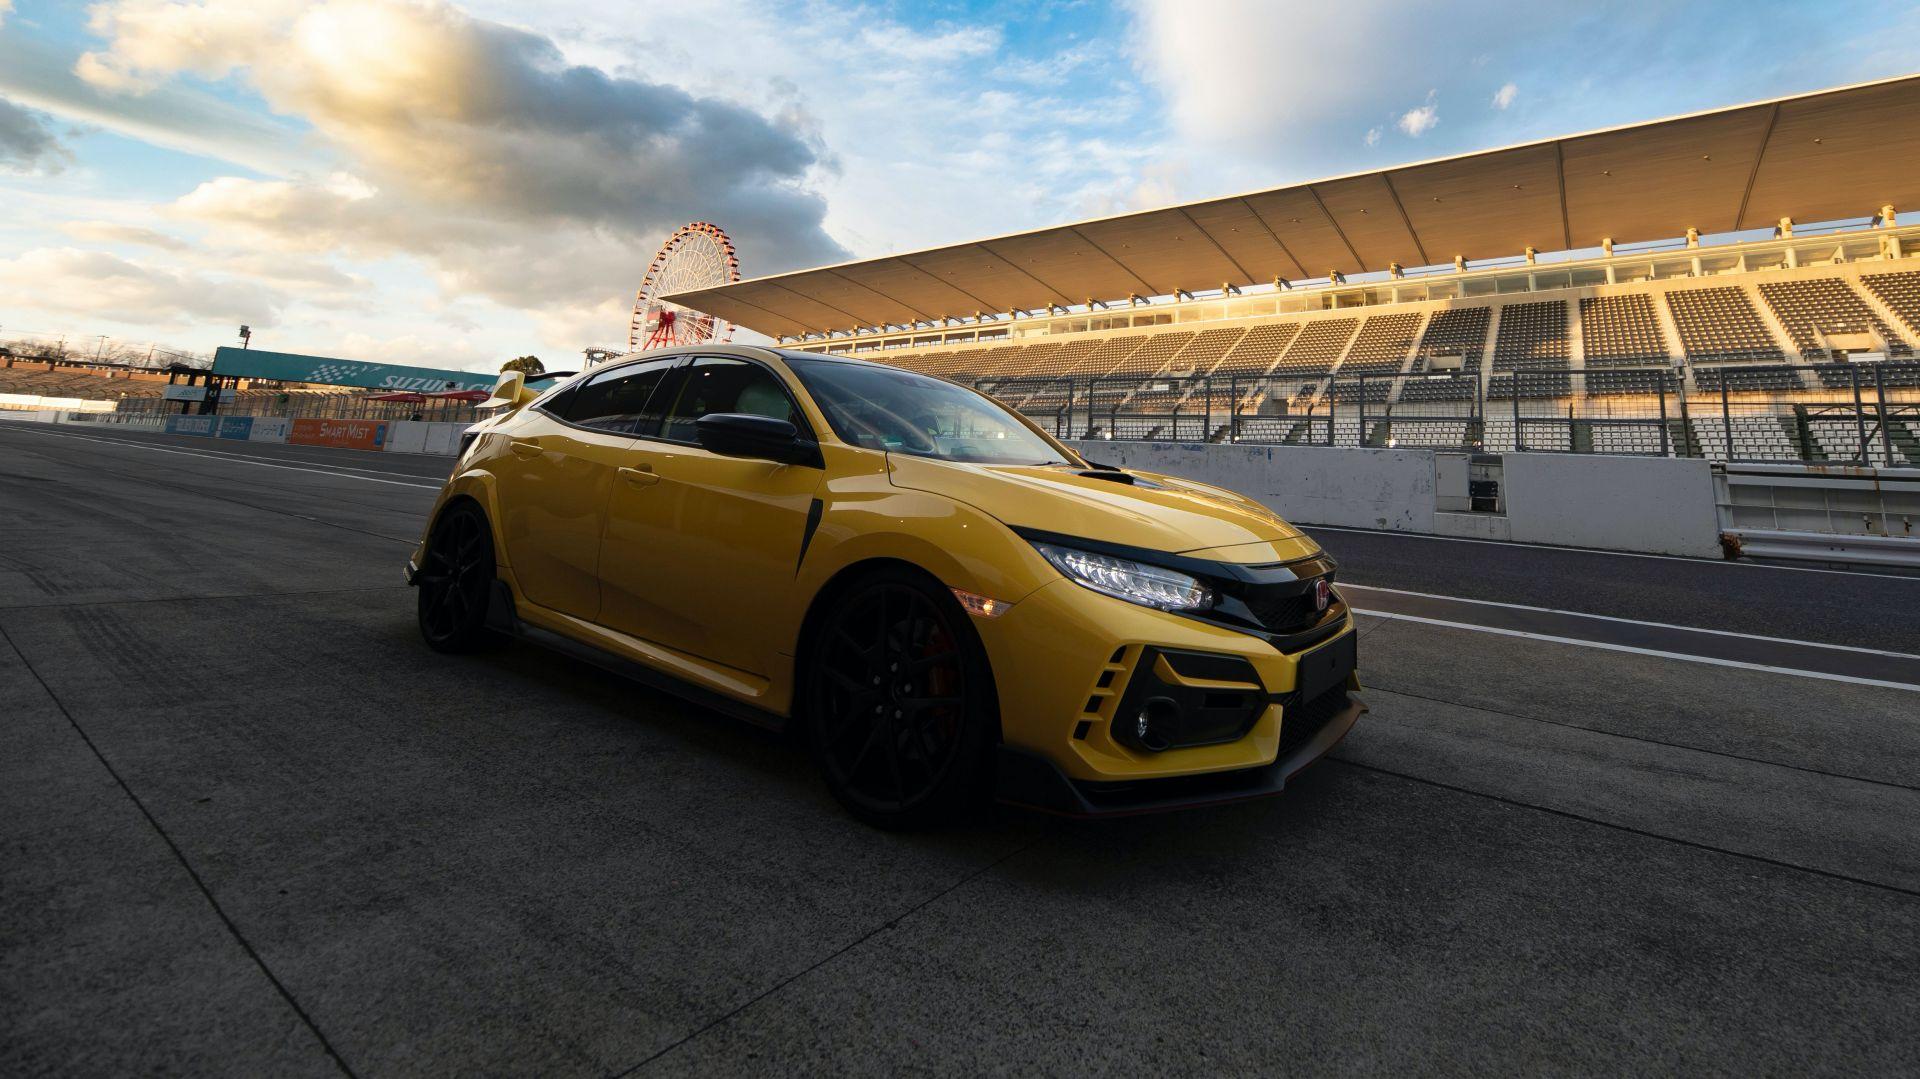 Honda Civic Type R Limited Edition sets new Suzuka lap record 3